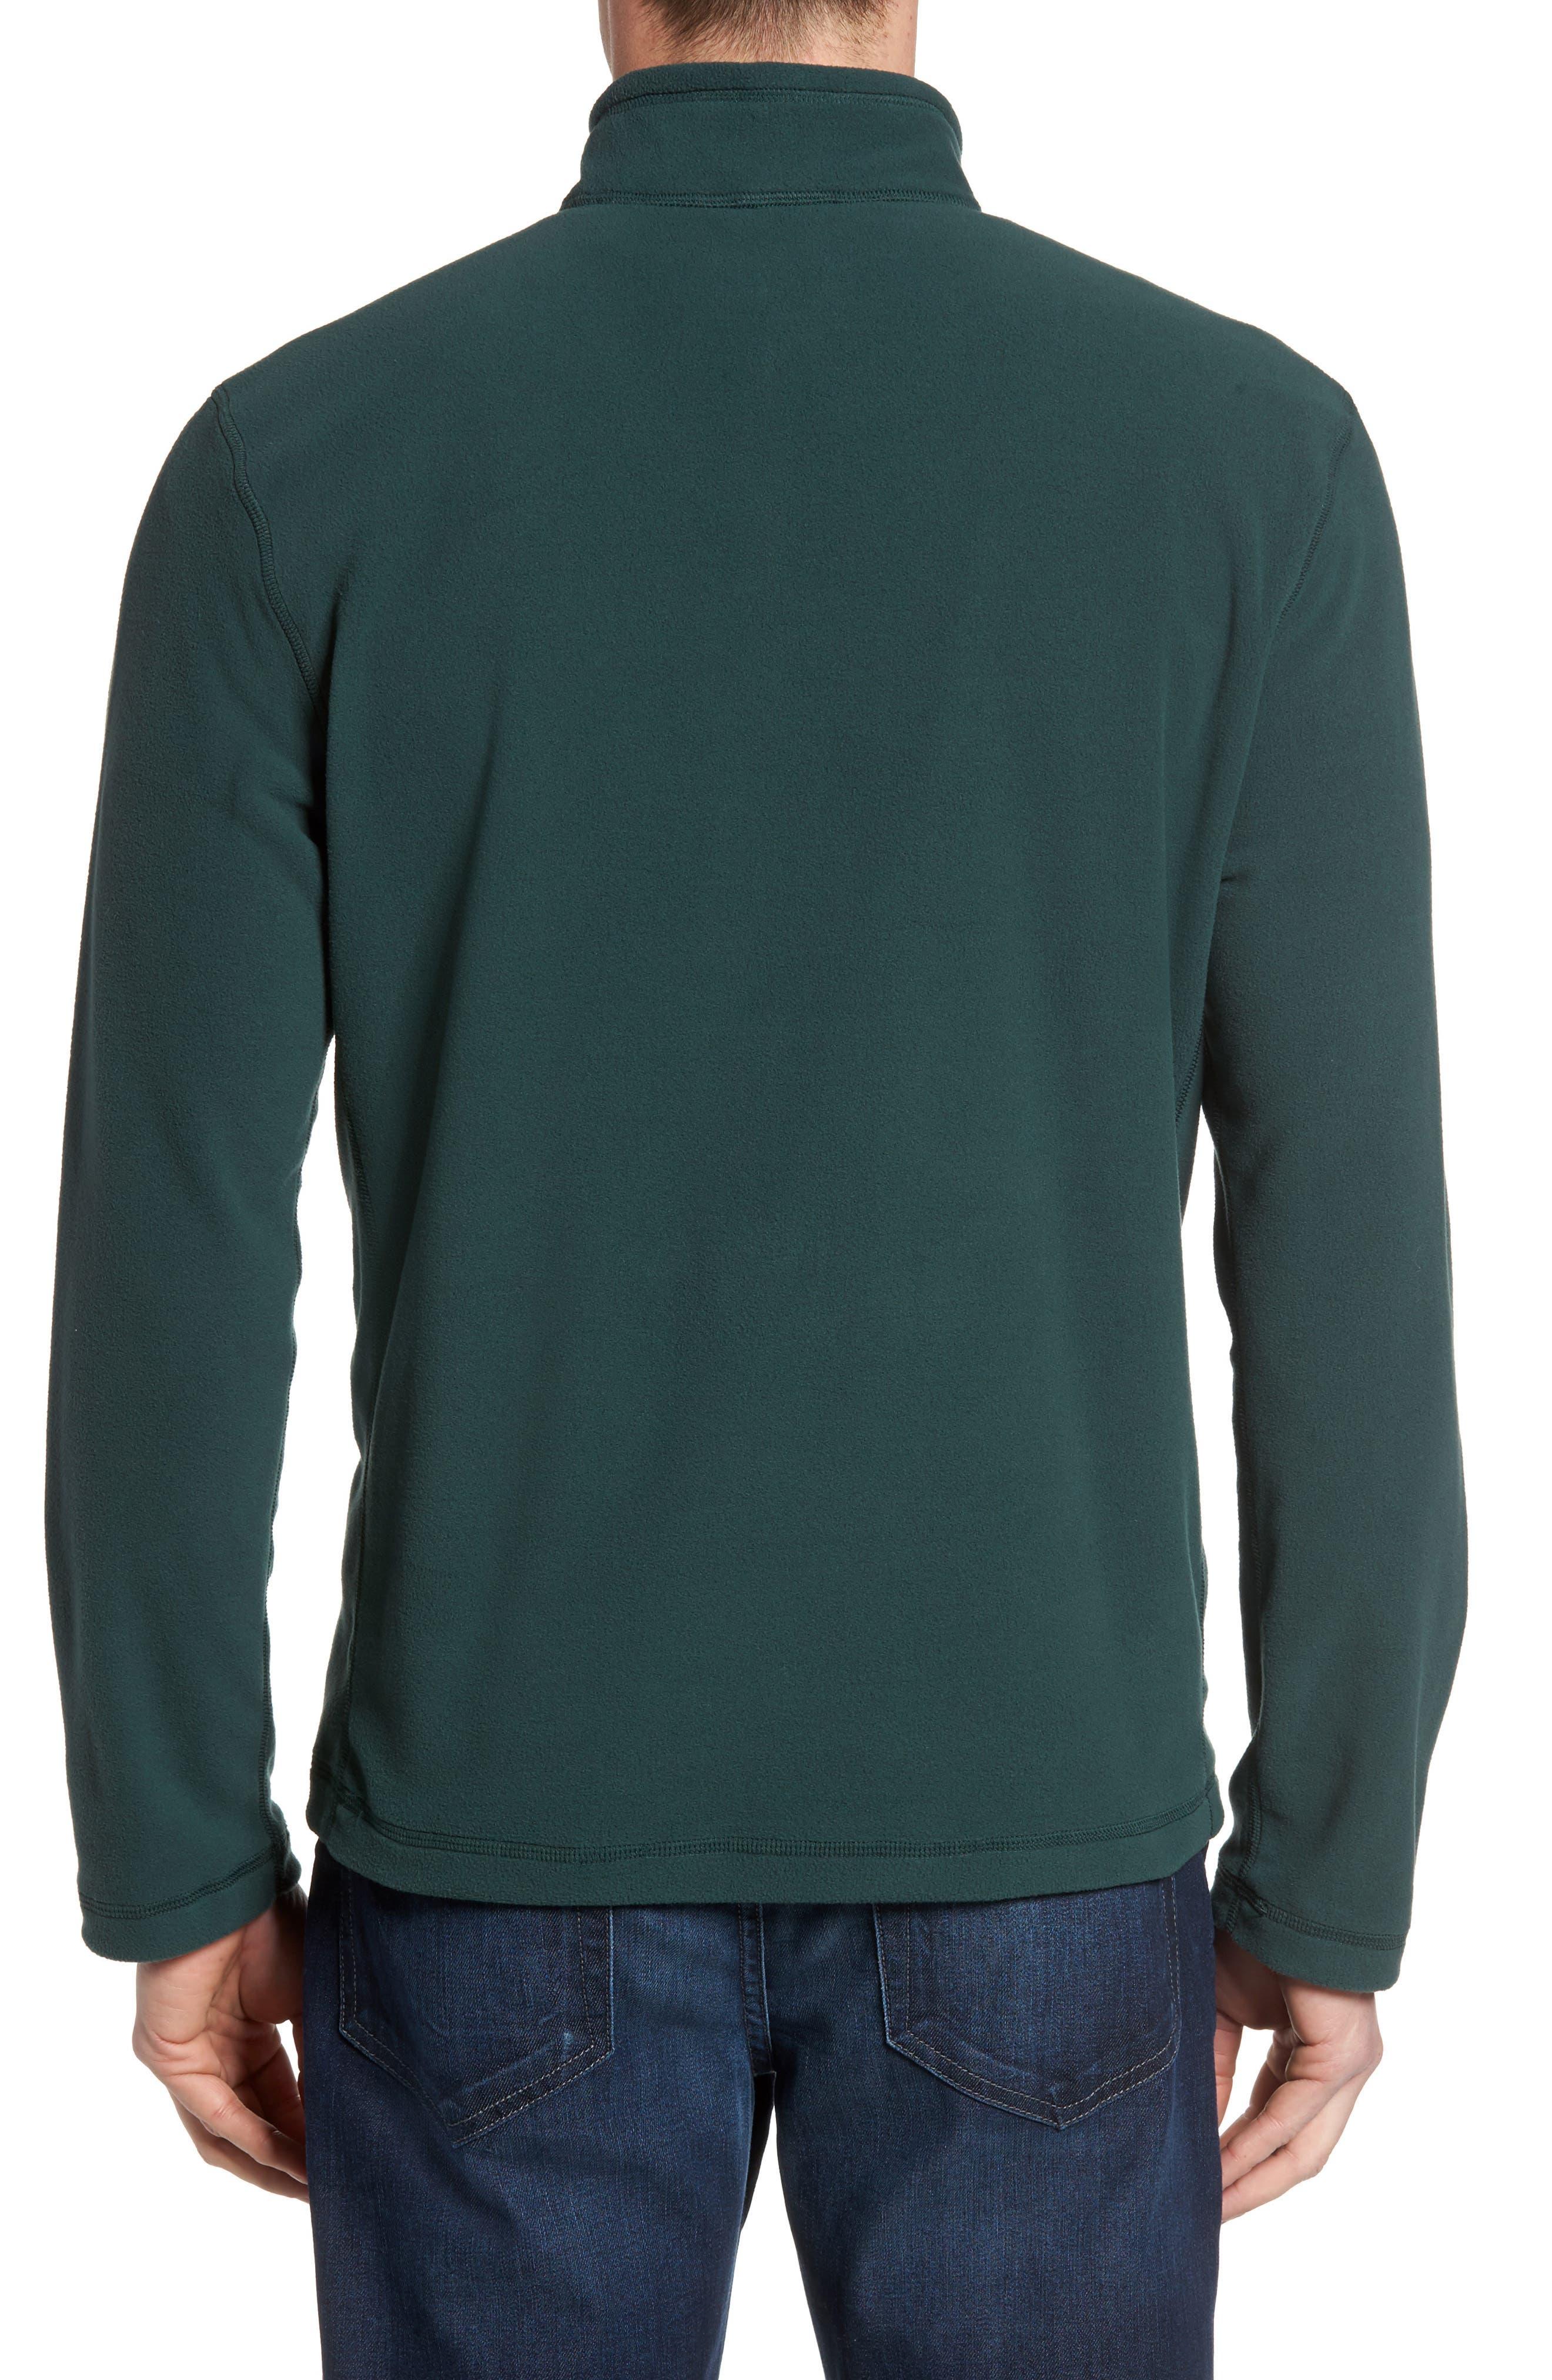 'TKA 100 Glacier' Quarter Zip Fleece Pullover,                             Alternate thumbnail 75, color,